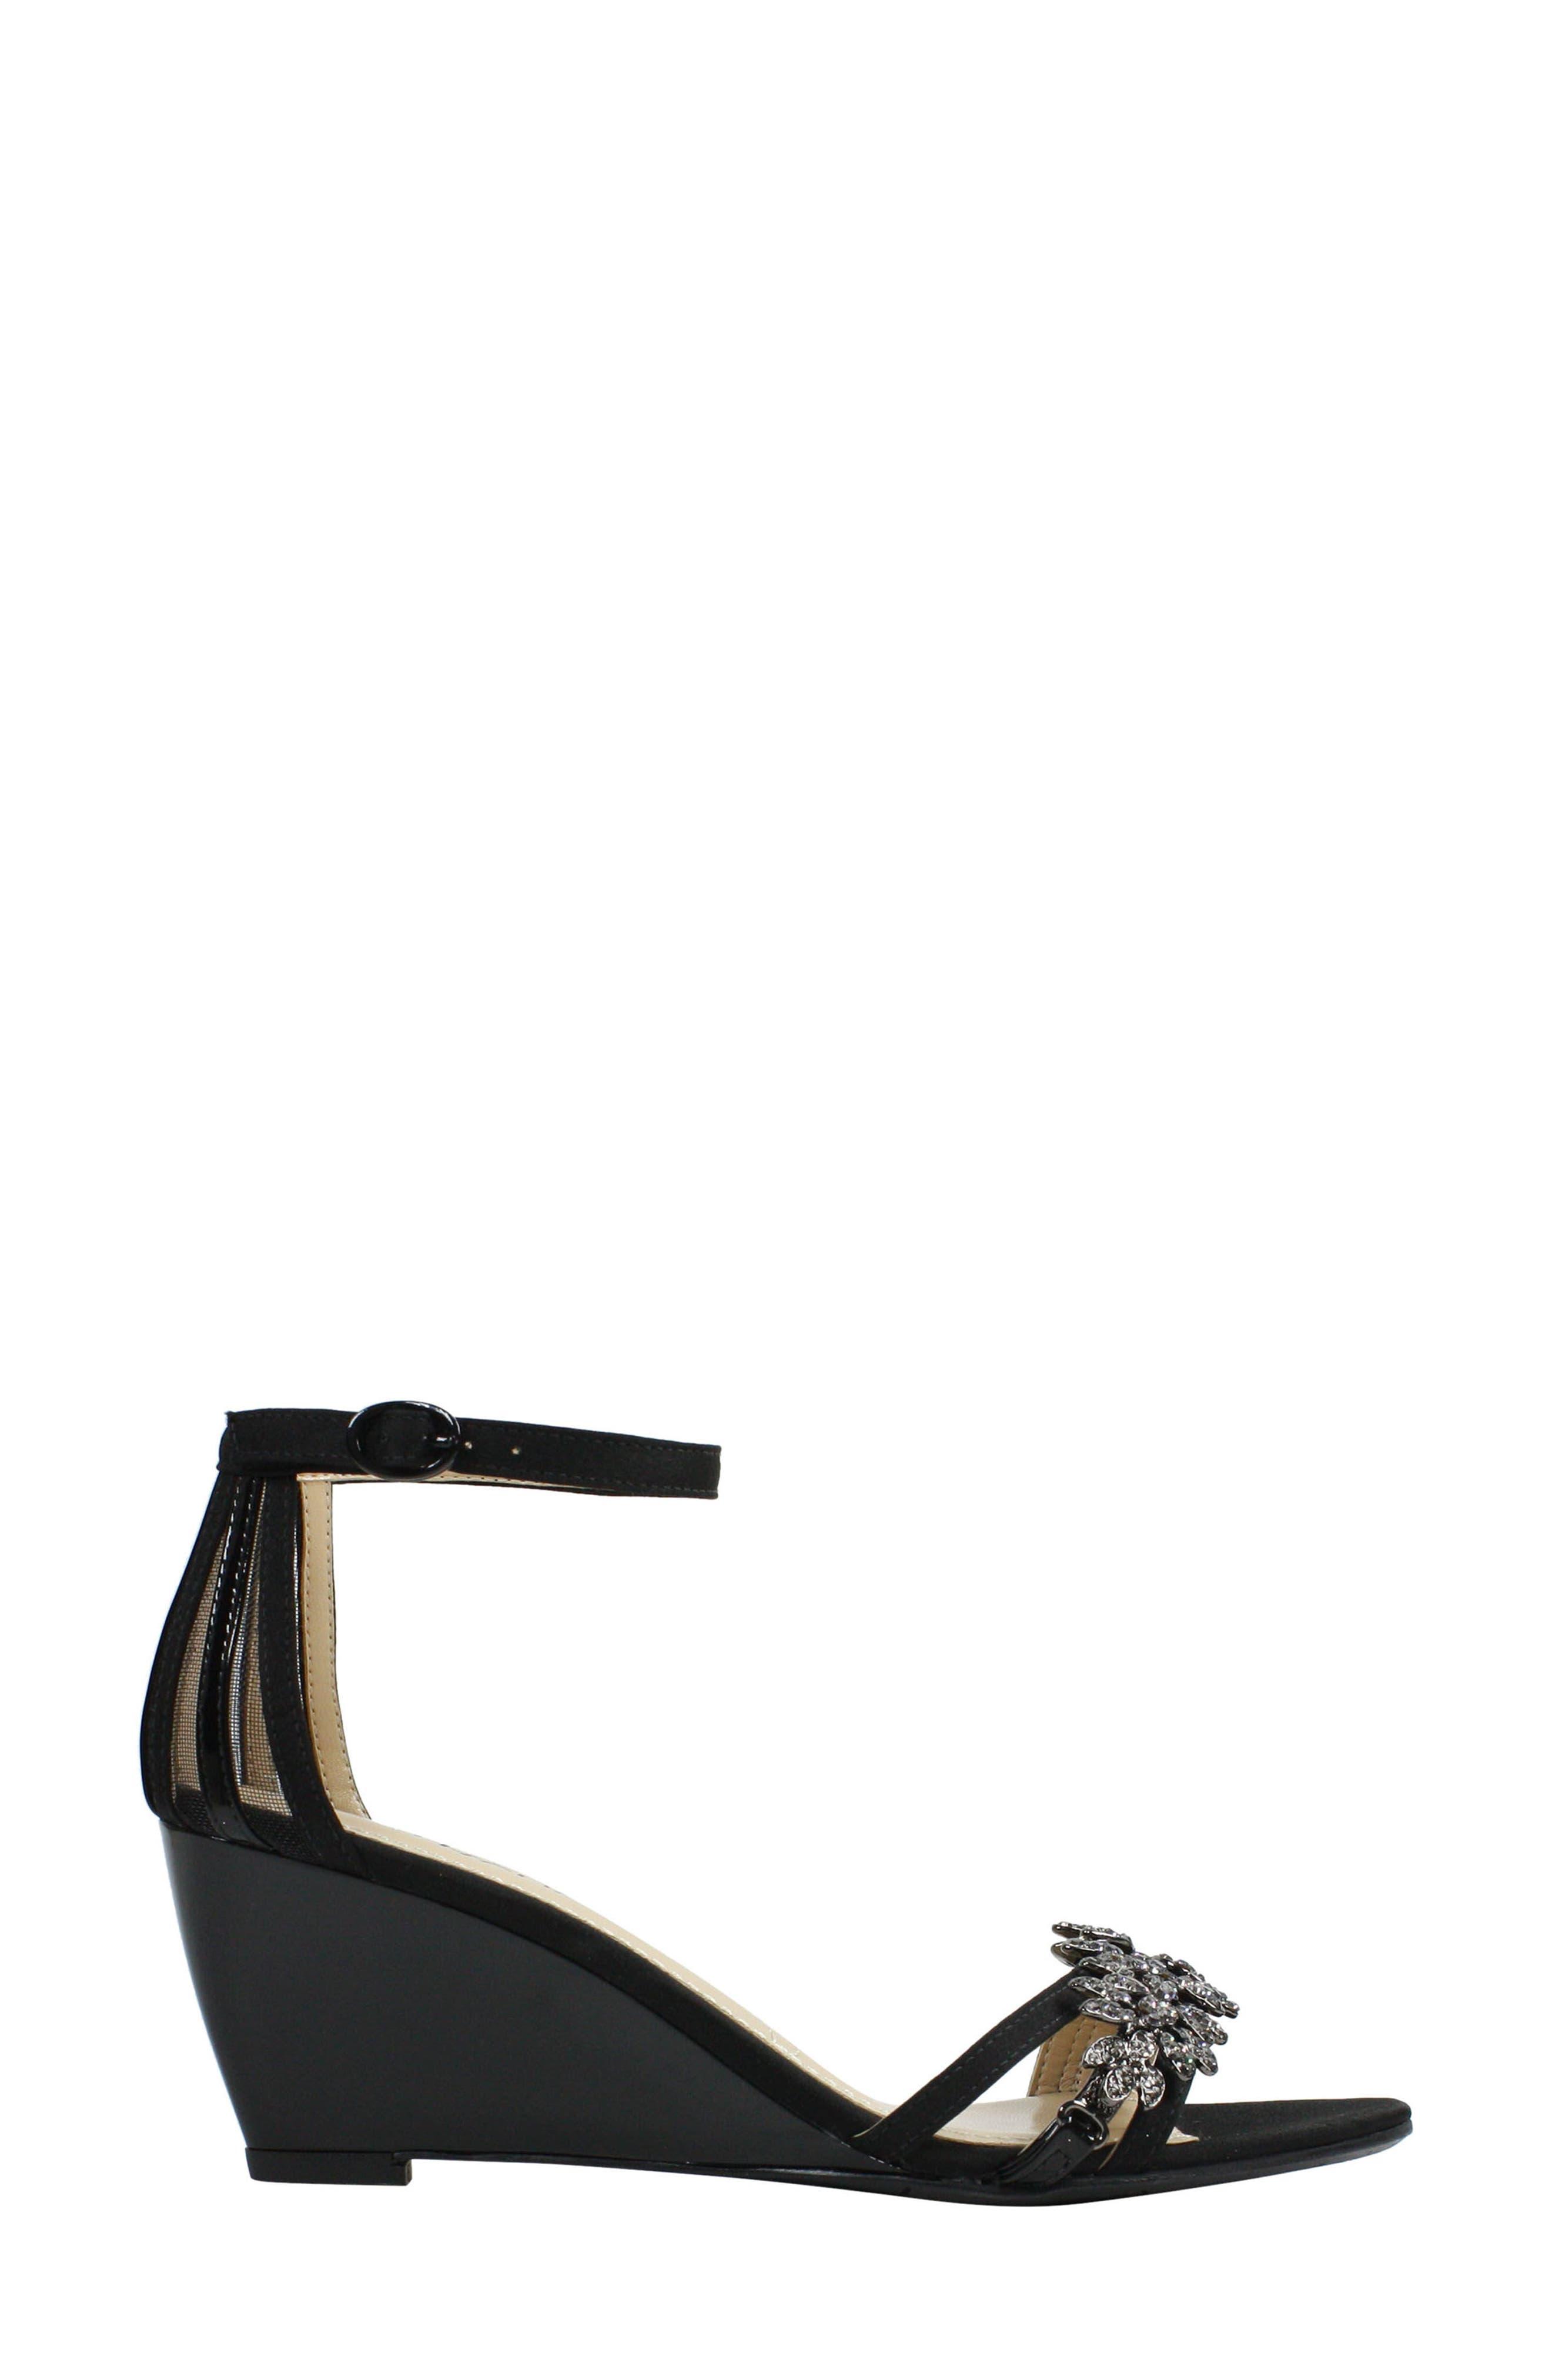 Mariabelle Ankle Strap Sandal,                             Alternate thumbnail 2, color,                             BLACK